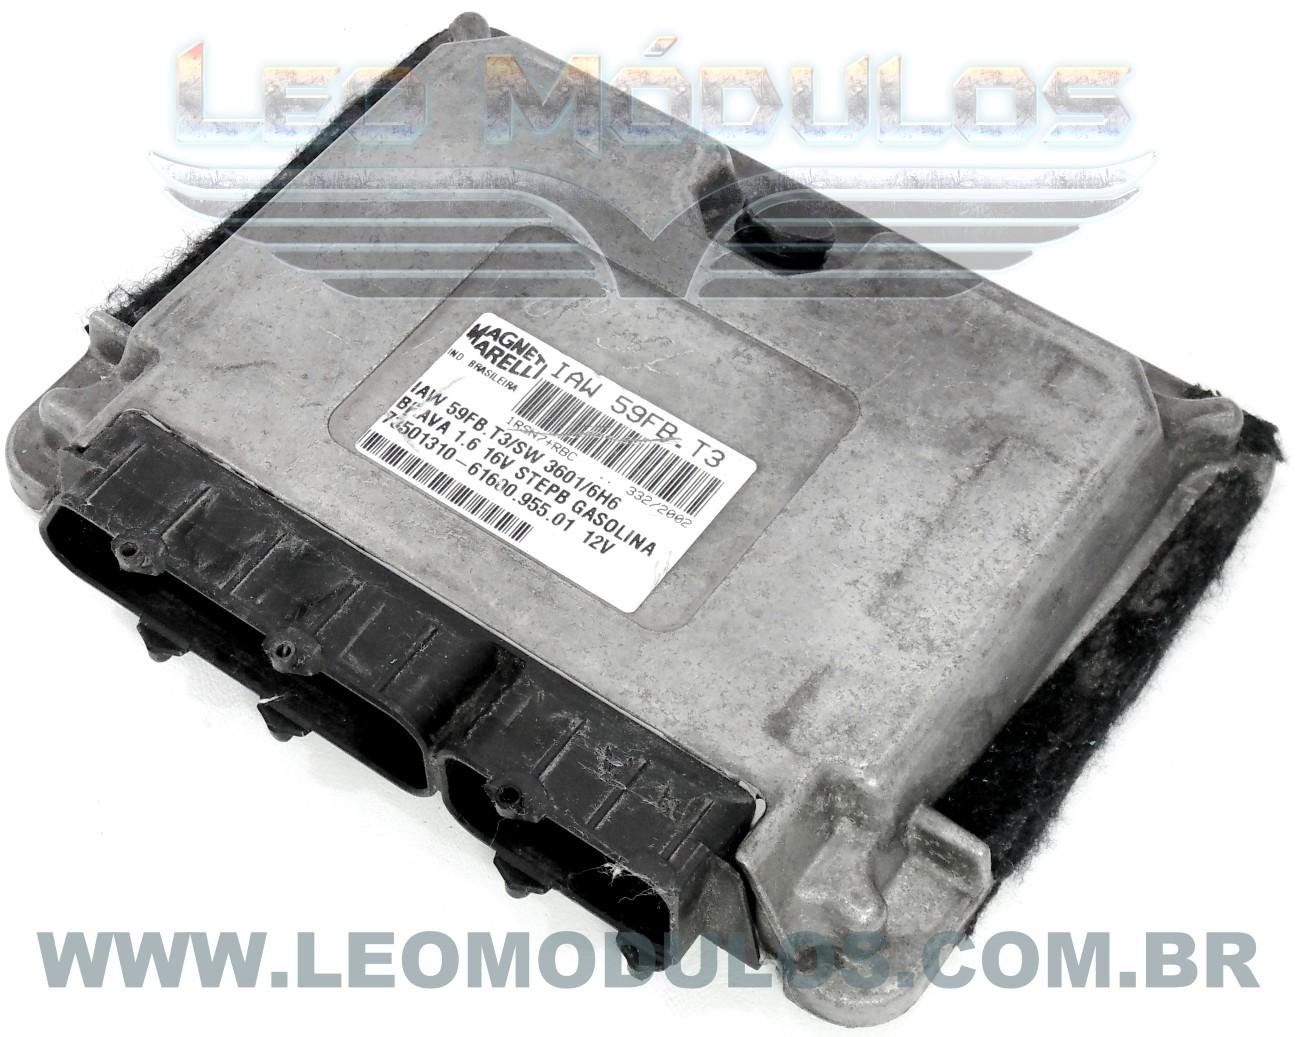 Módulo de injeção marelli - IAW 59FB.T3 - 73501310 - Fiat Brava 1.6 16V Gasolina - 61601.955.01 IAW 59FBT3 - Leo Módulos